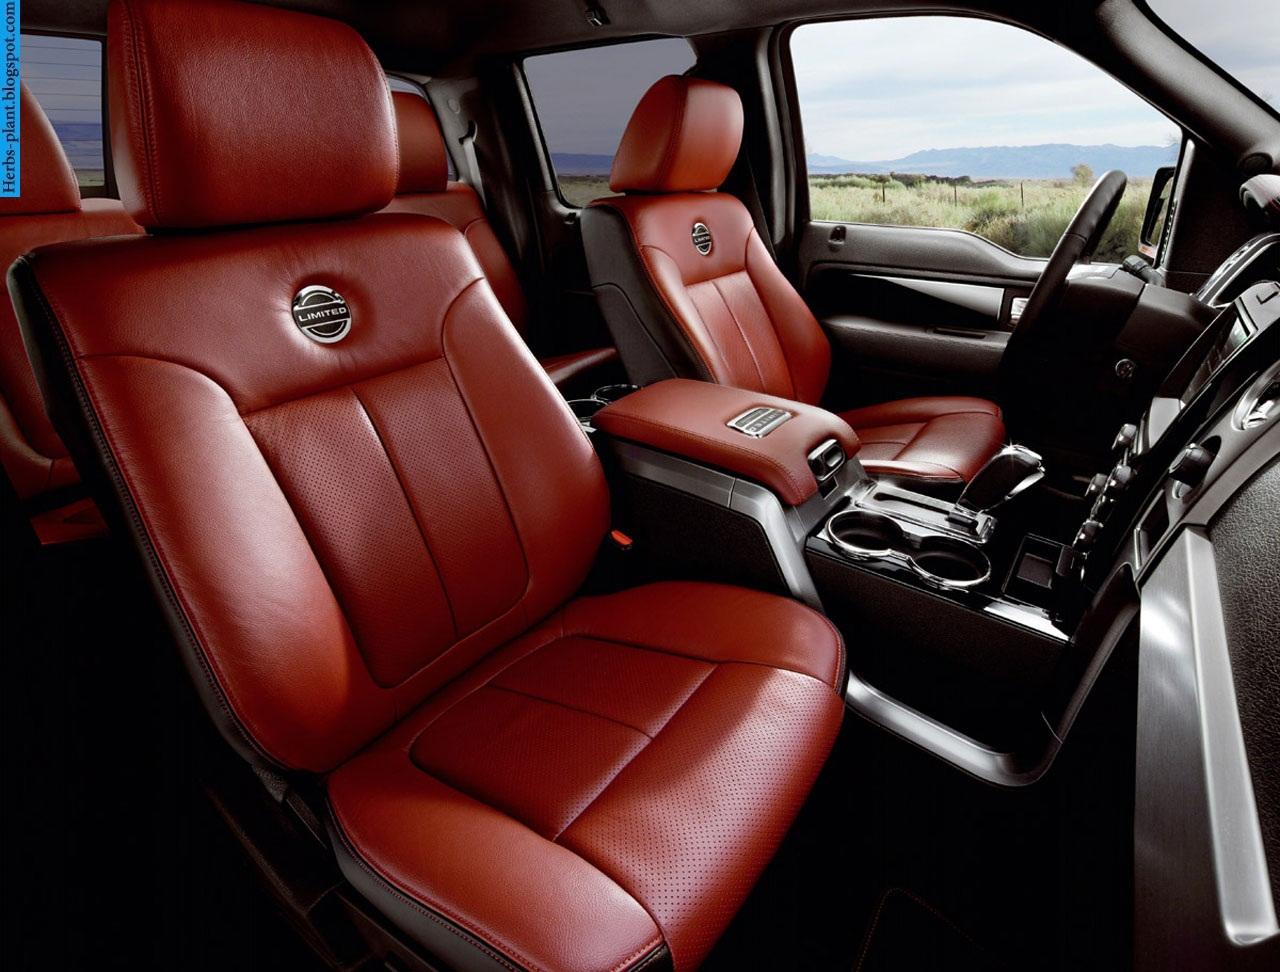 Ford f150 car 2013 interior - صور سيارة فورد ف150 2013 من الداخل